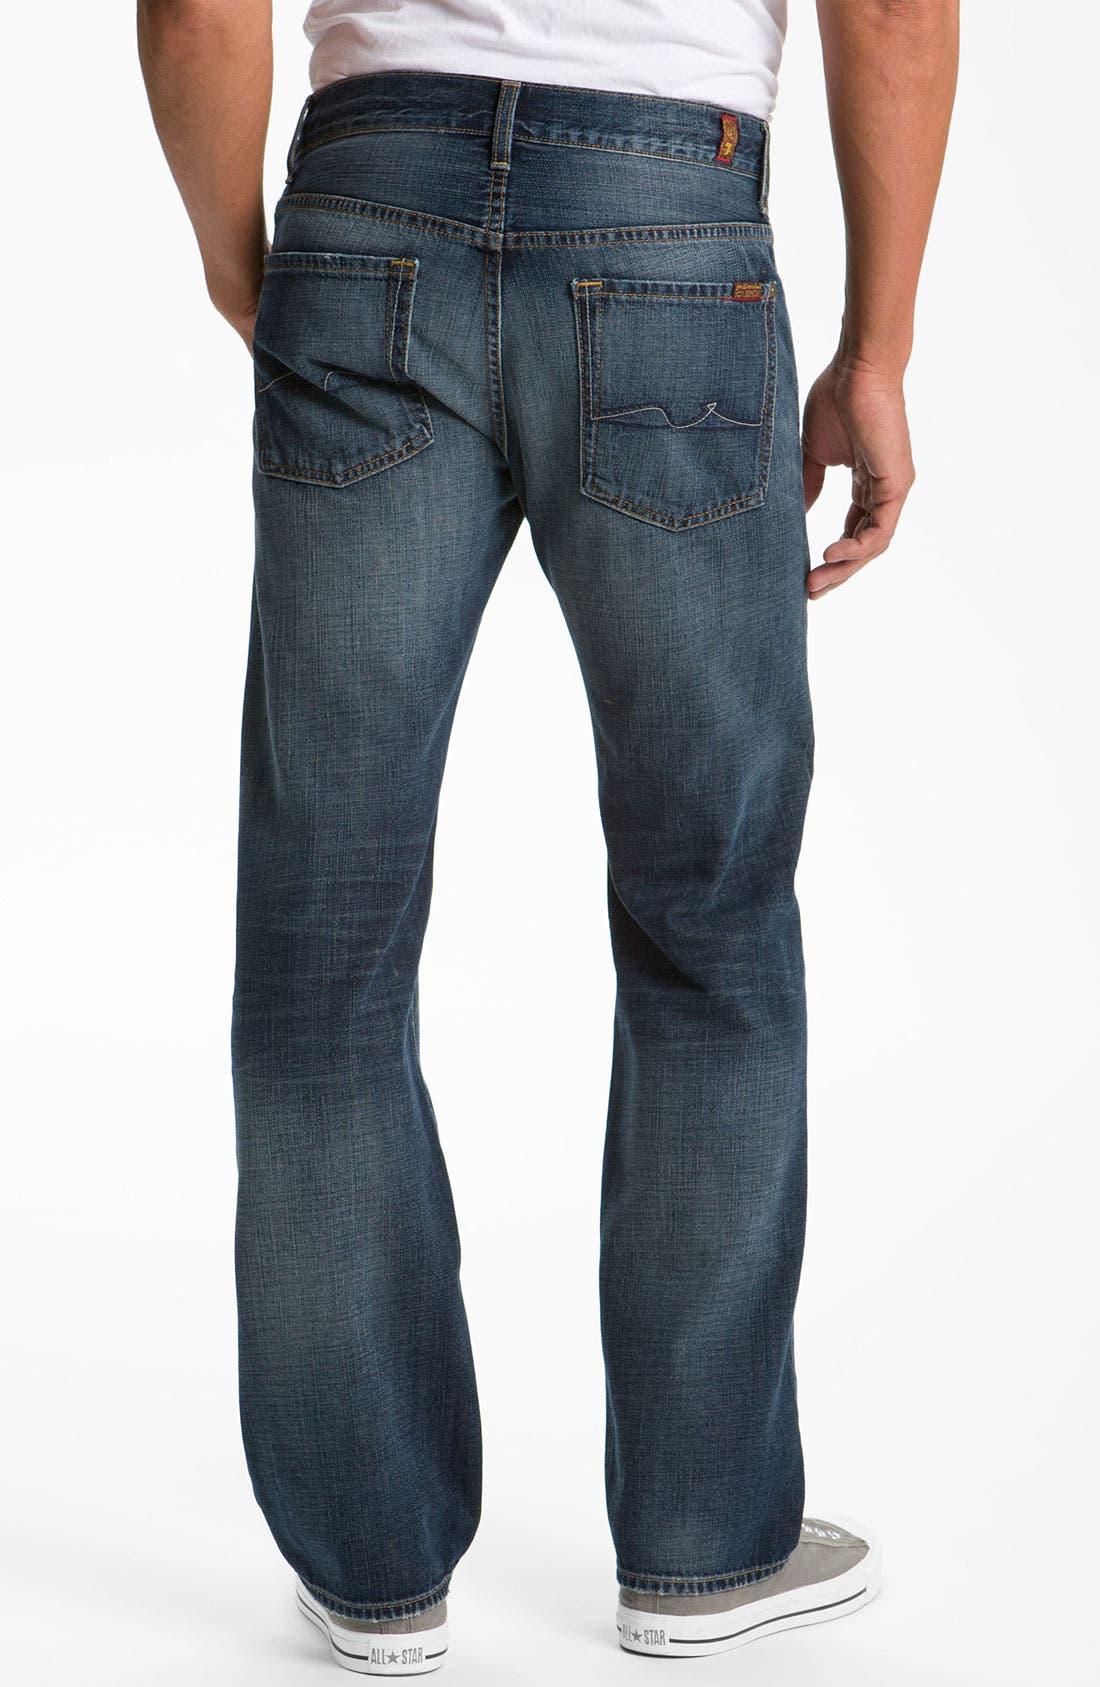 Main Image - 7 For All Mankind® 'Austyn' Relaxed Straight Leg Jeans (California Dusk)